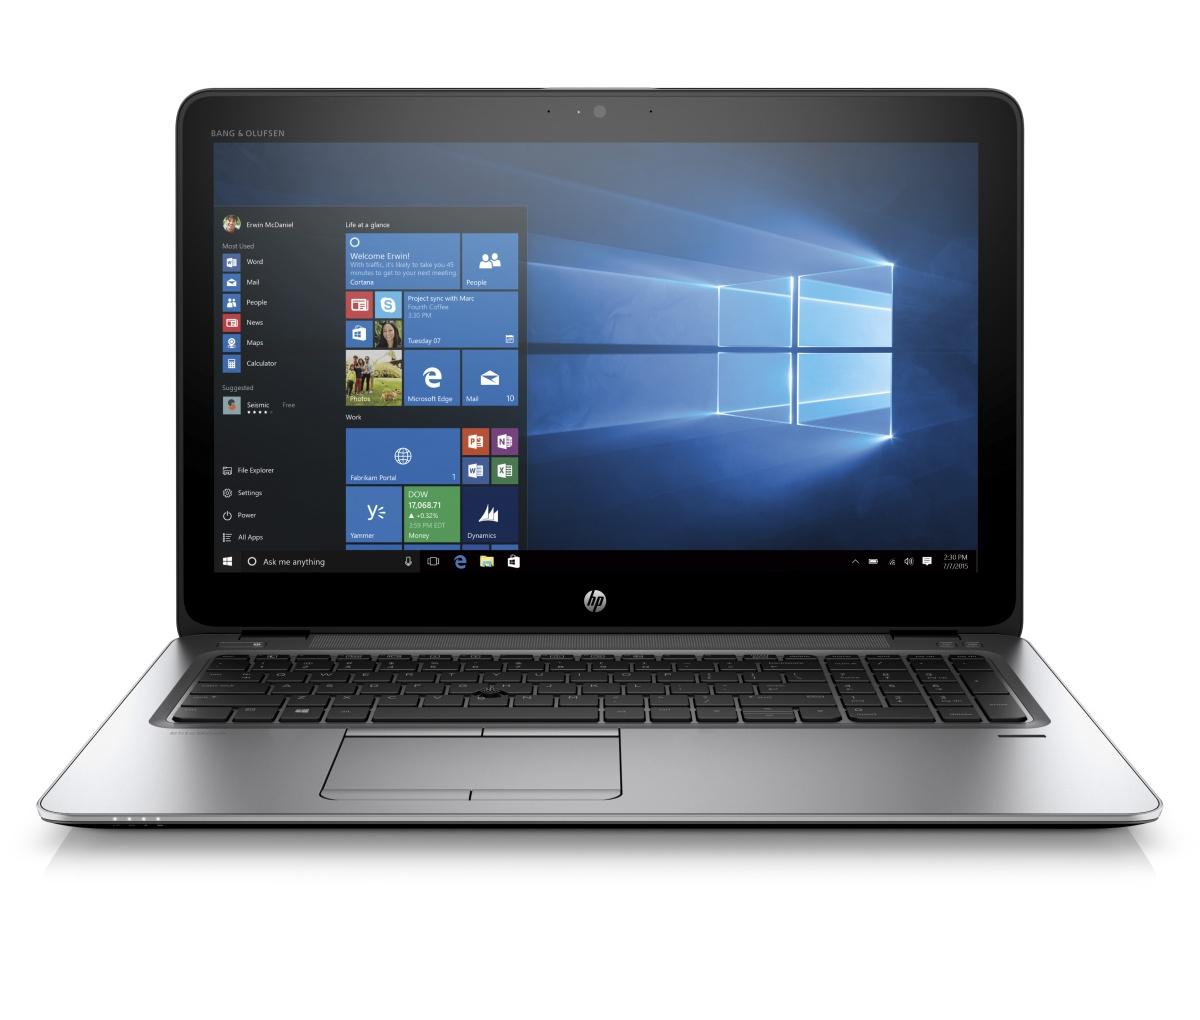 HP EliteBook 850 G3 i5-6200U 15.6 FHD 4GB 256GB-SSD FPR backlt W7P+W10P